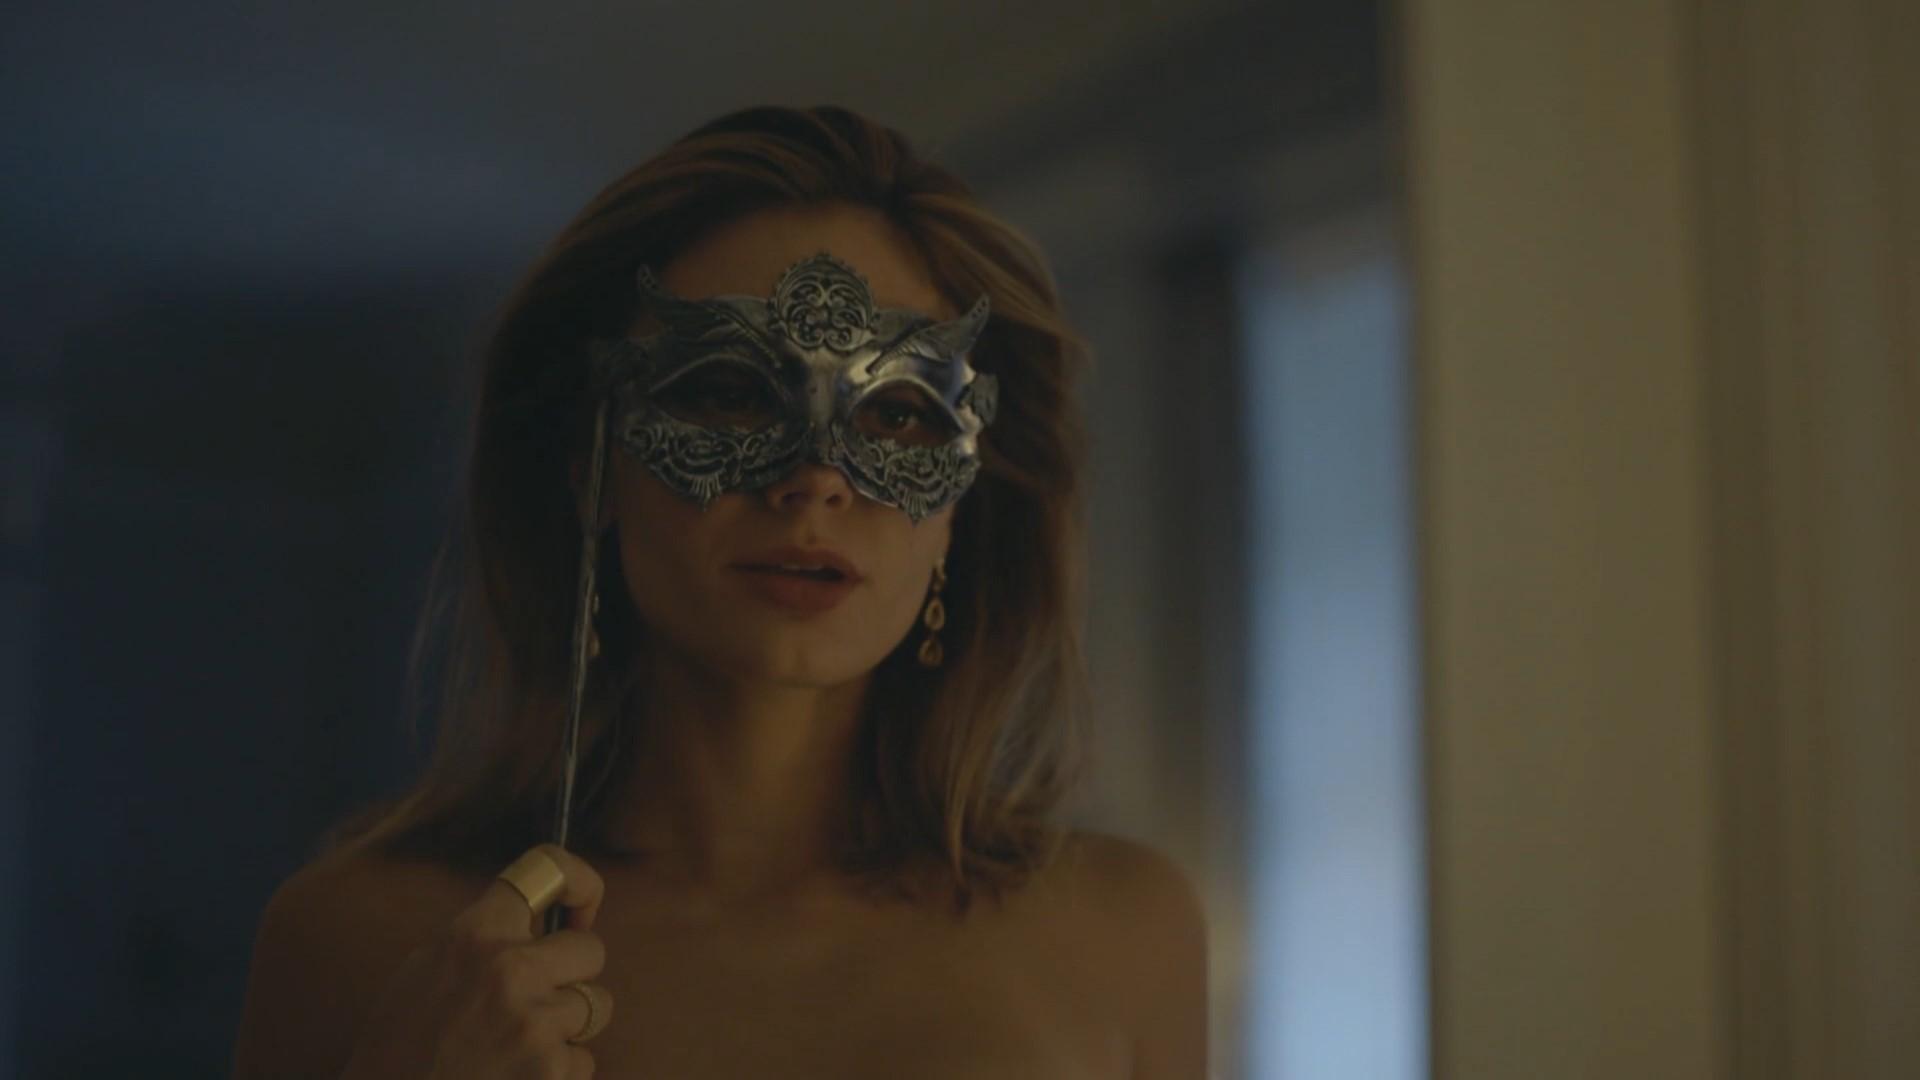 Nothing Daniela silverio nude